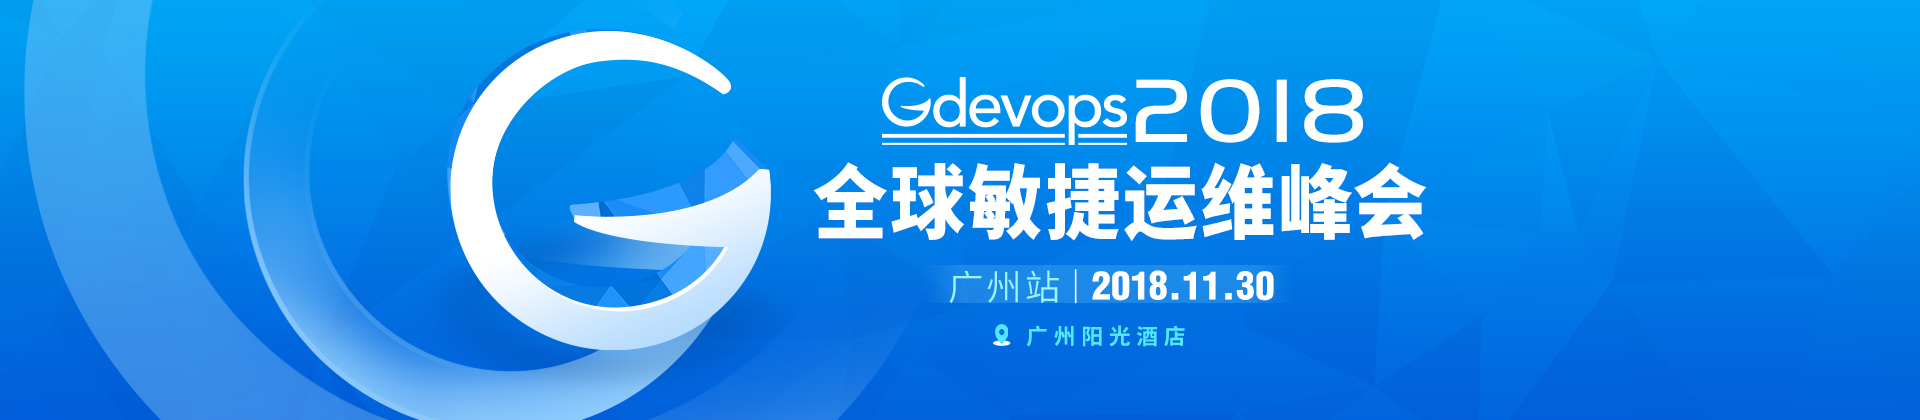 Gdevops峰会上午场:阿里、腾讯、新炬网络等技术大牛齐聚(广州站)